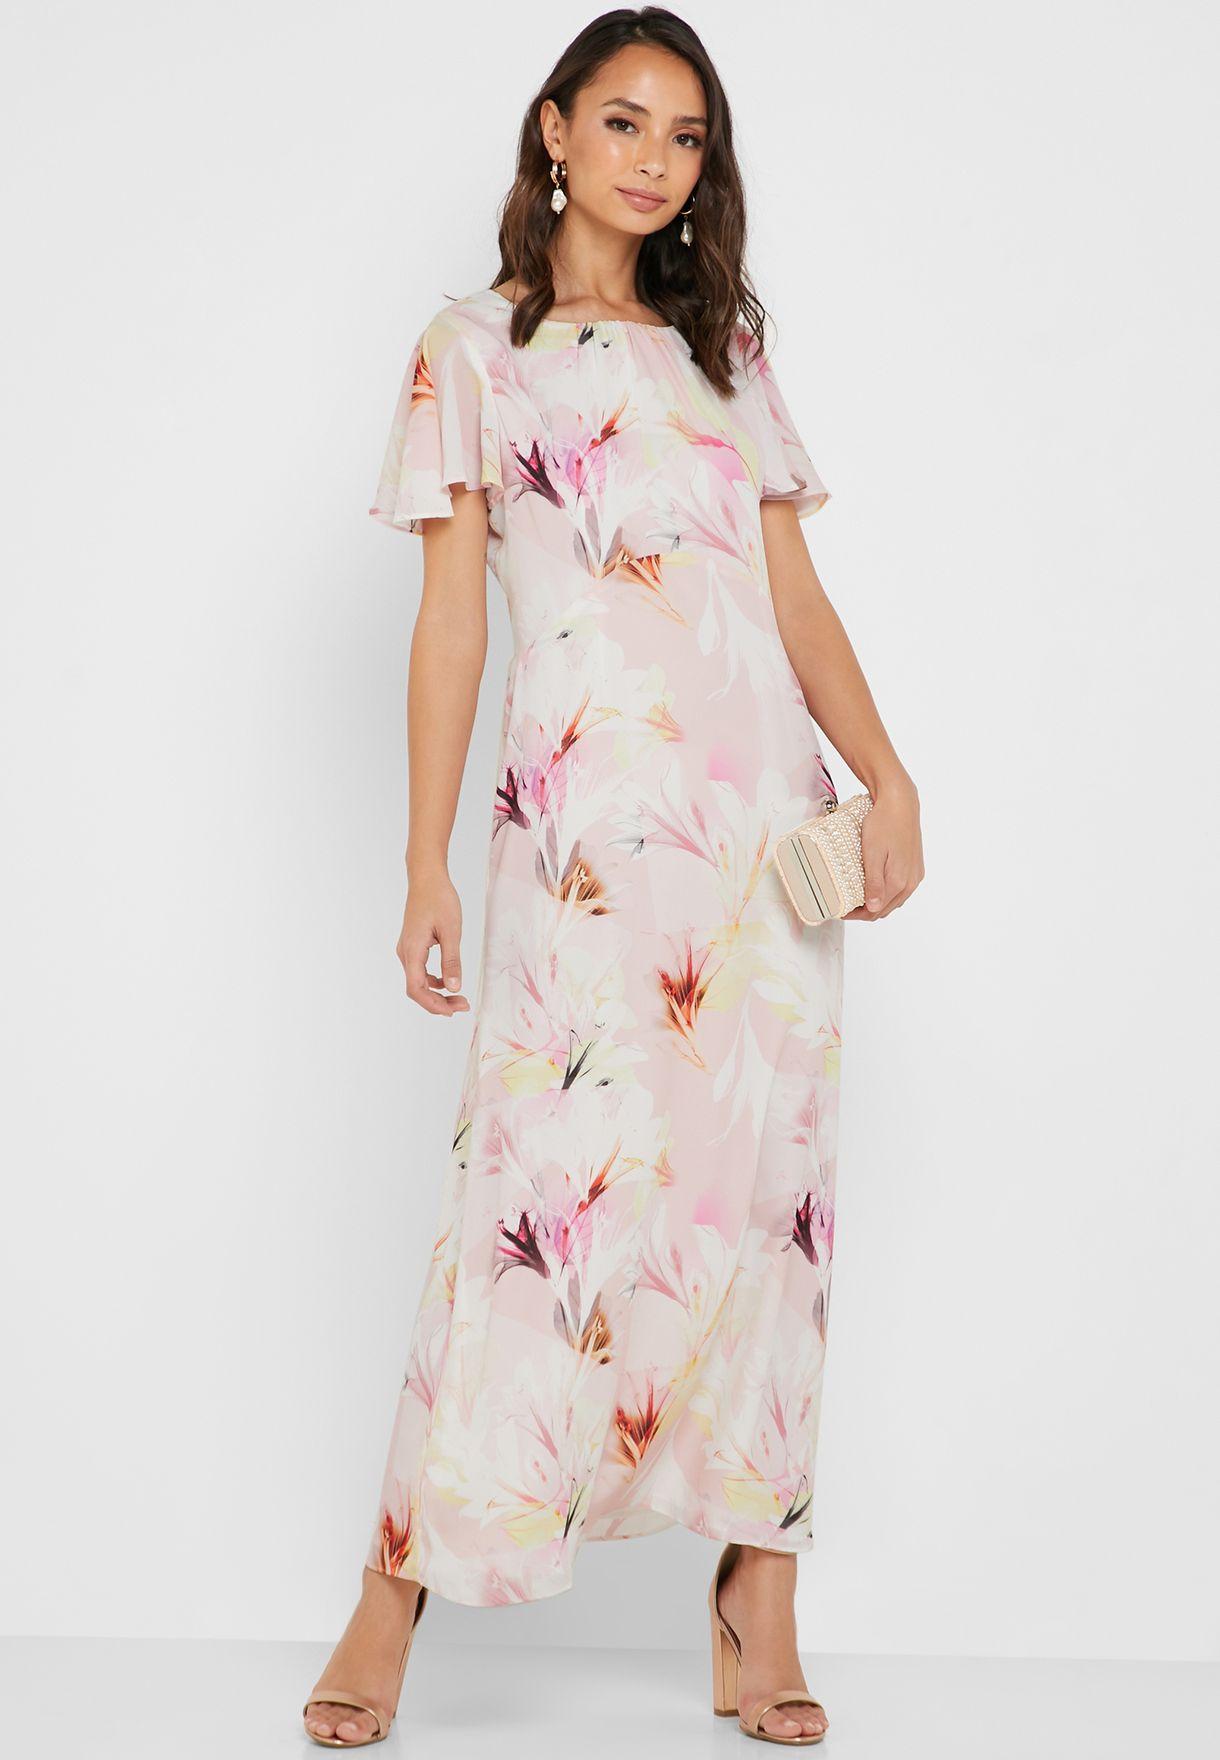 4854f038c3f Shop Wallis Petite prints Floral Print Maxi Dress 99113017 for Women ...